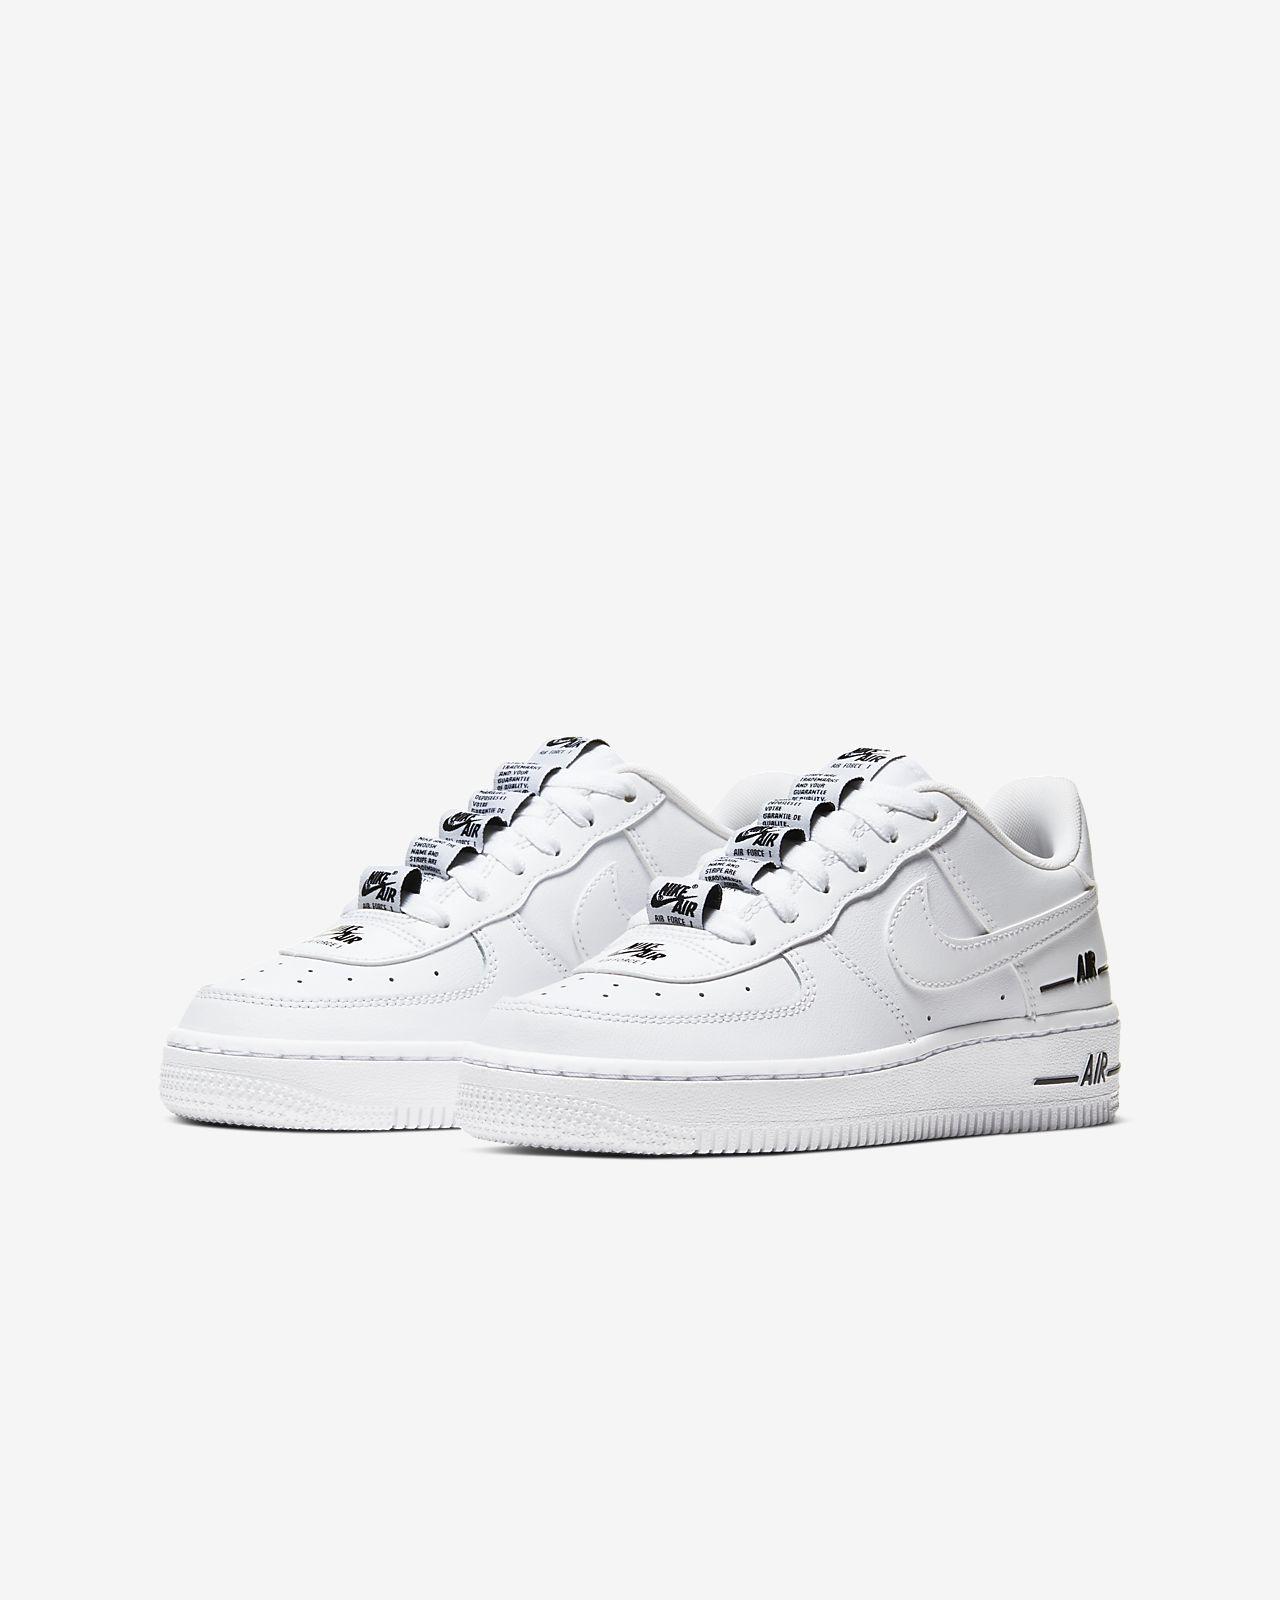 Buty dla dużych dzieci Nike Air Force 1 LV8